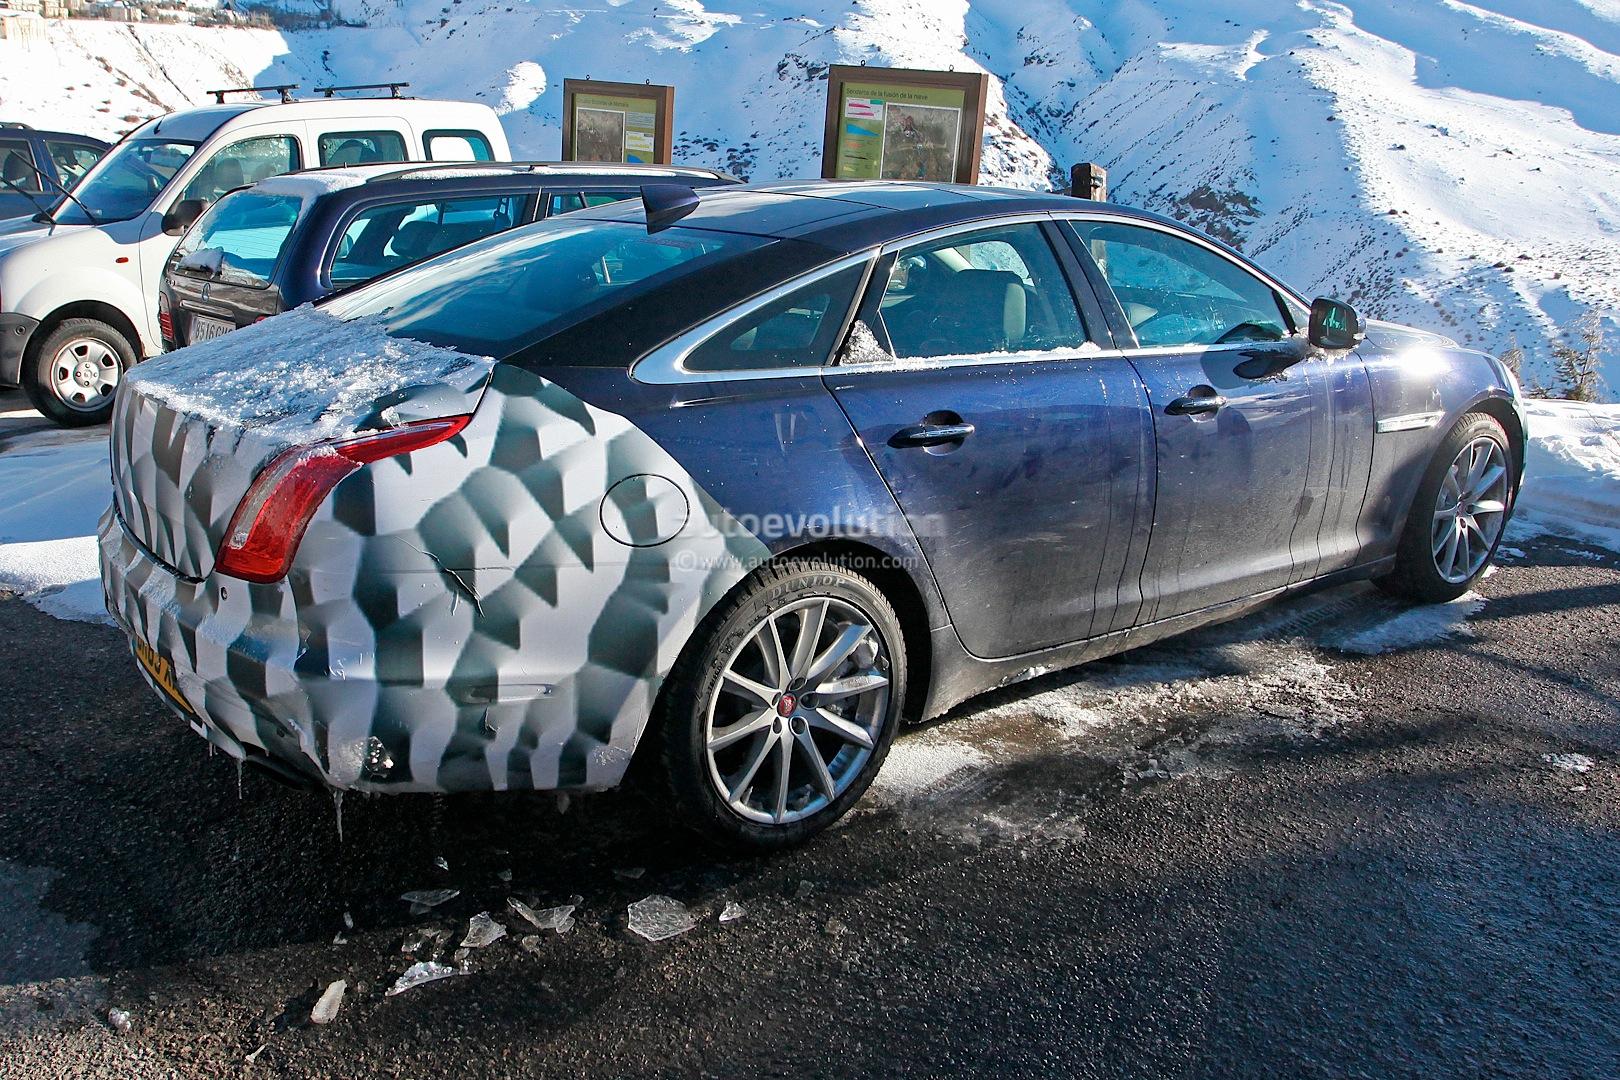 New volkswagen cars owings mills vw dealer autos post for Owings mills motor cars